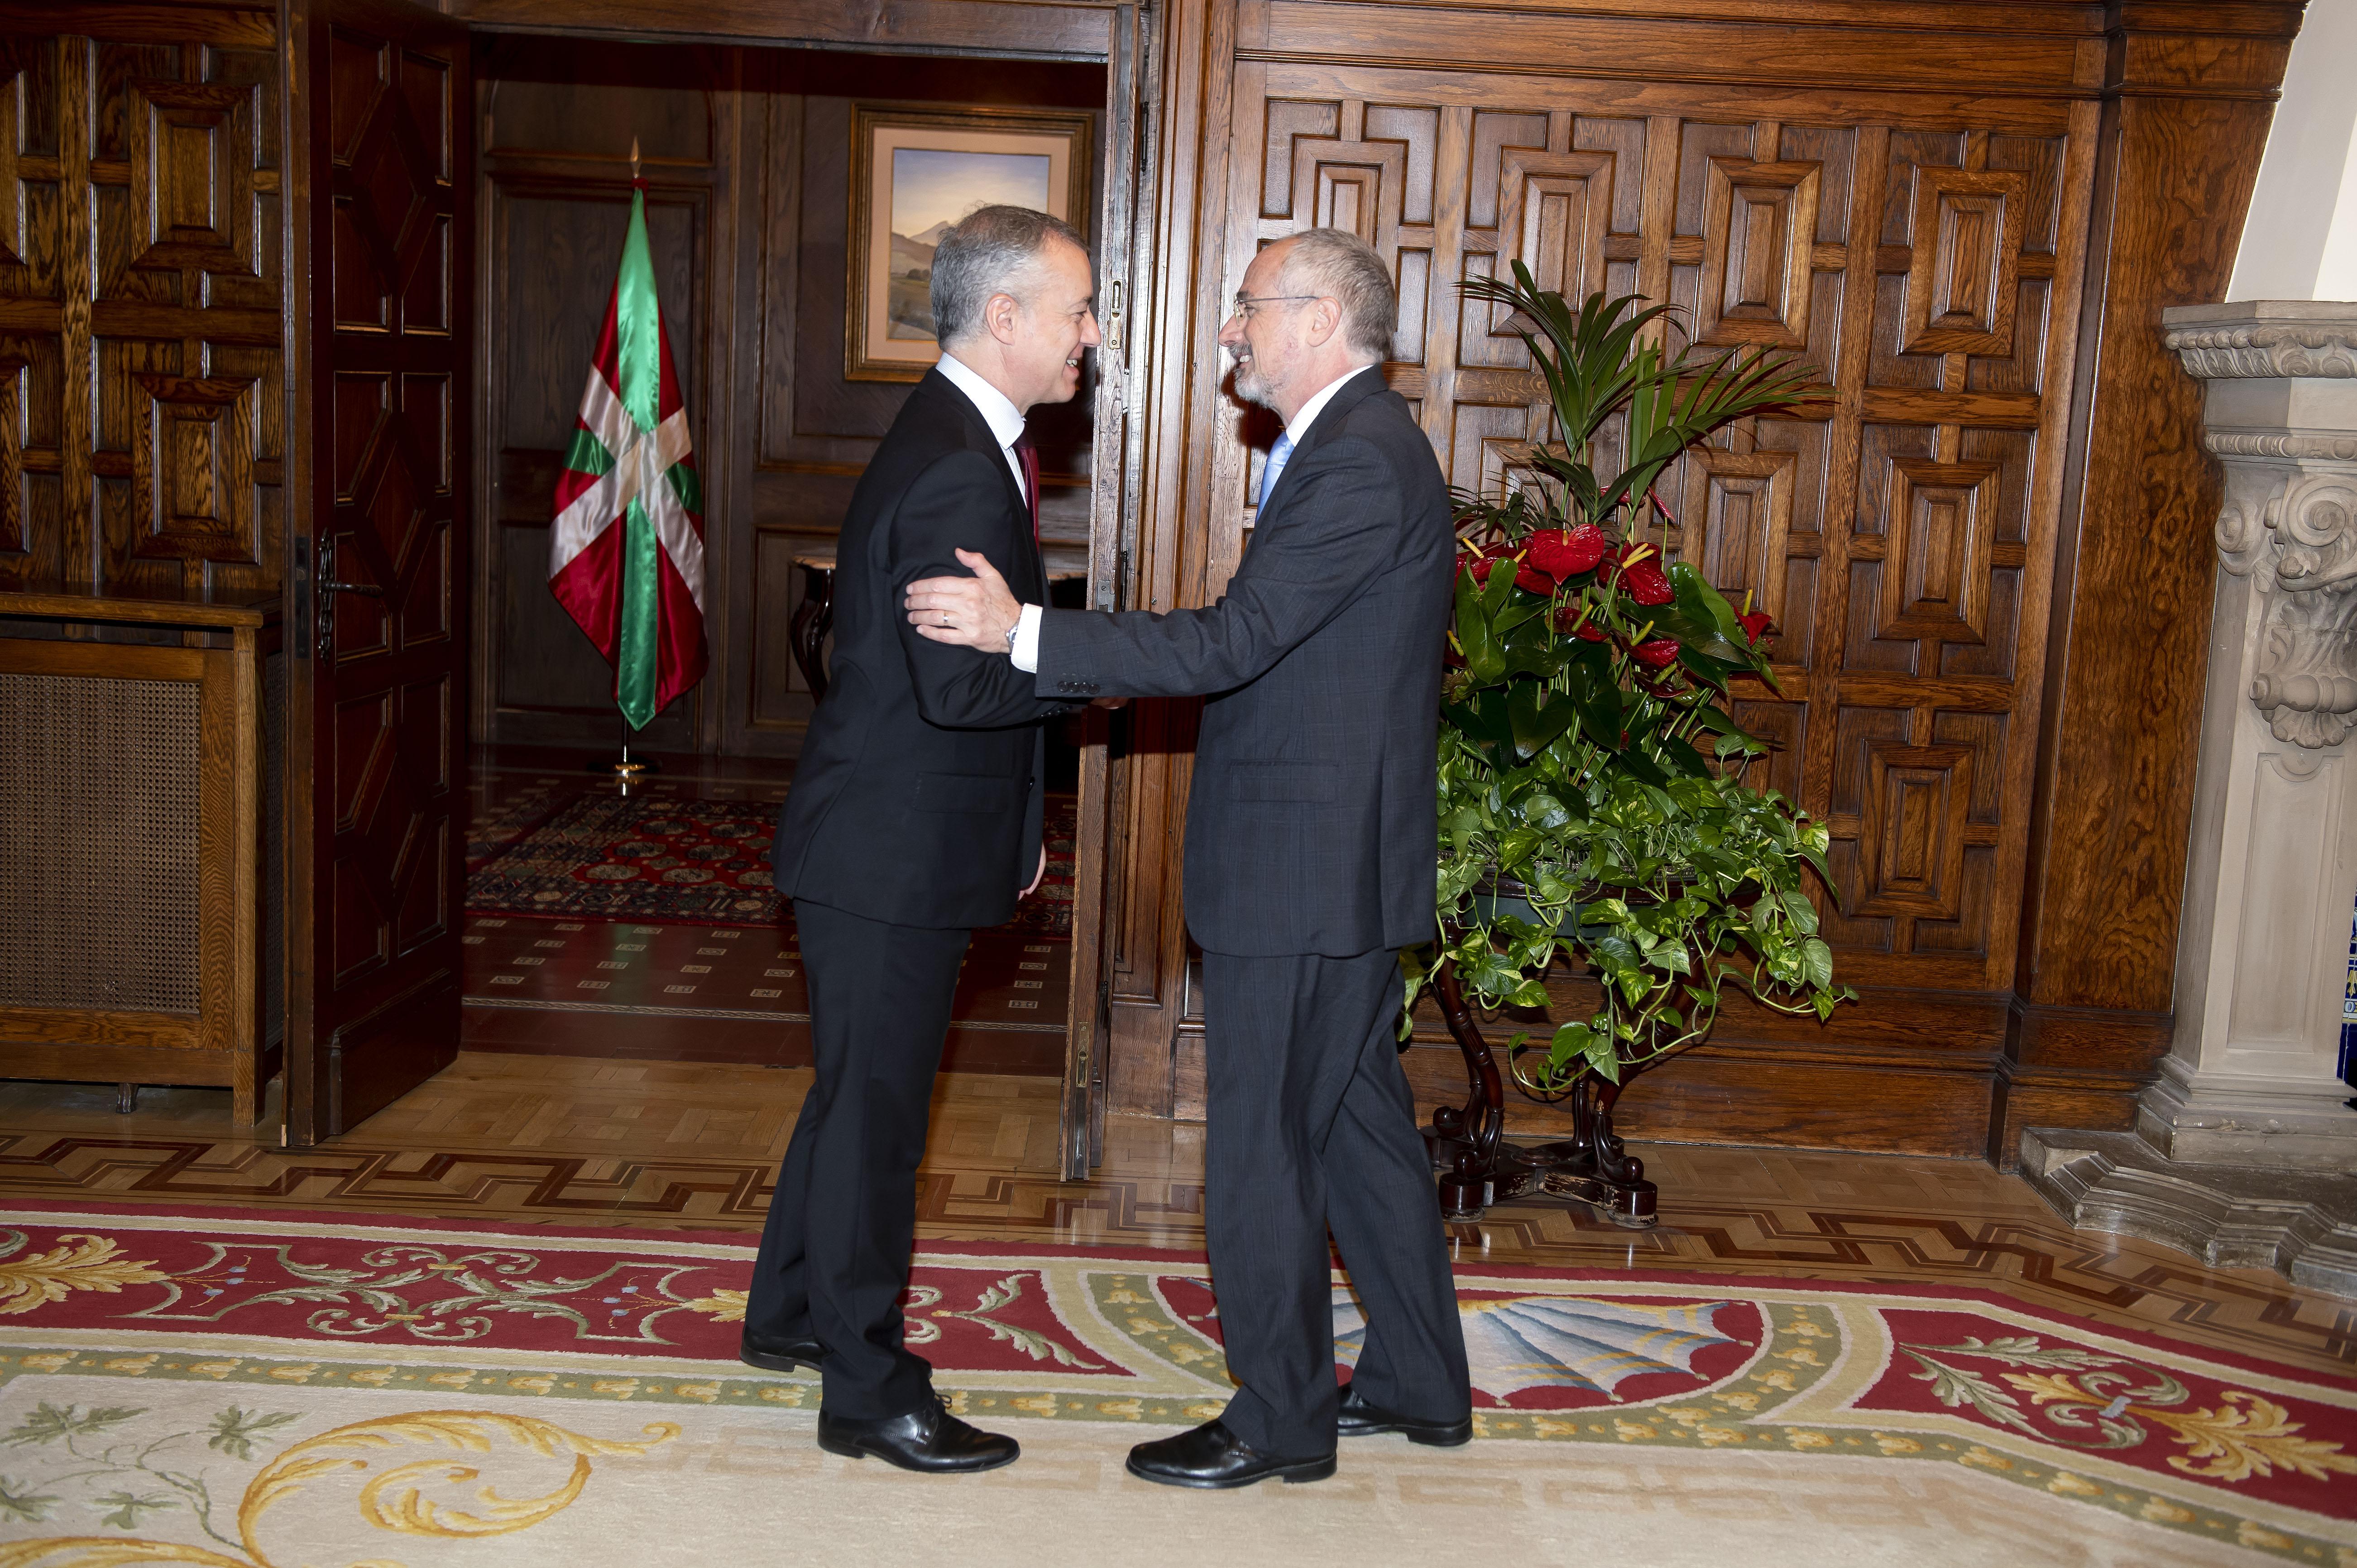 El Lehendakarirecibe al Embajador de Israel Daniel Kutner